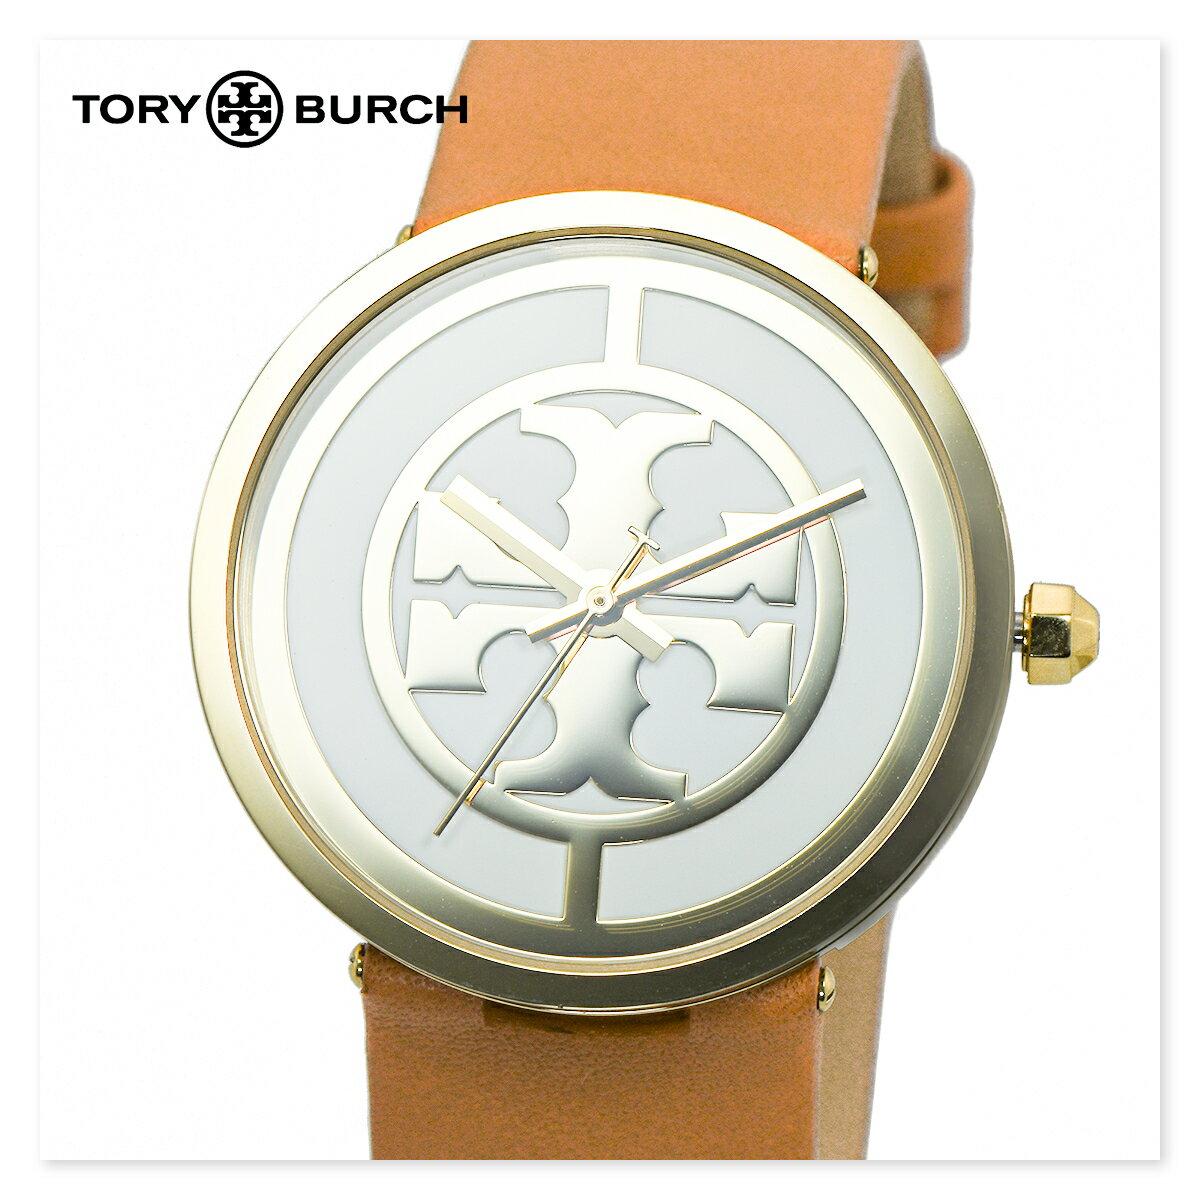 TORY BURCH トリーバーチ TB4020 Reva レディース 女性 時計 腕時計 プレゼント おしゃれ ギフト 贈り物 [海外正規商品][送料無料]